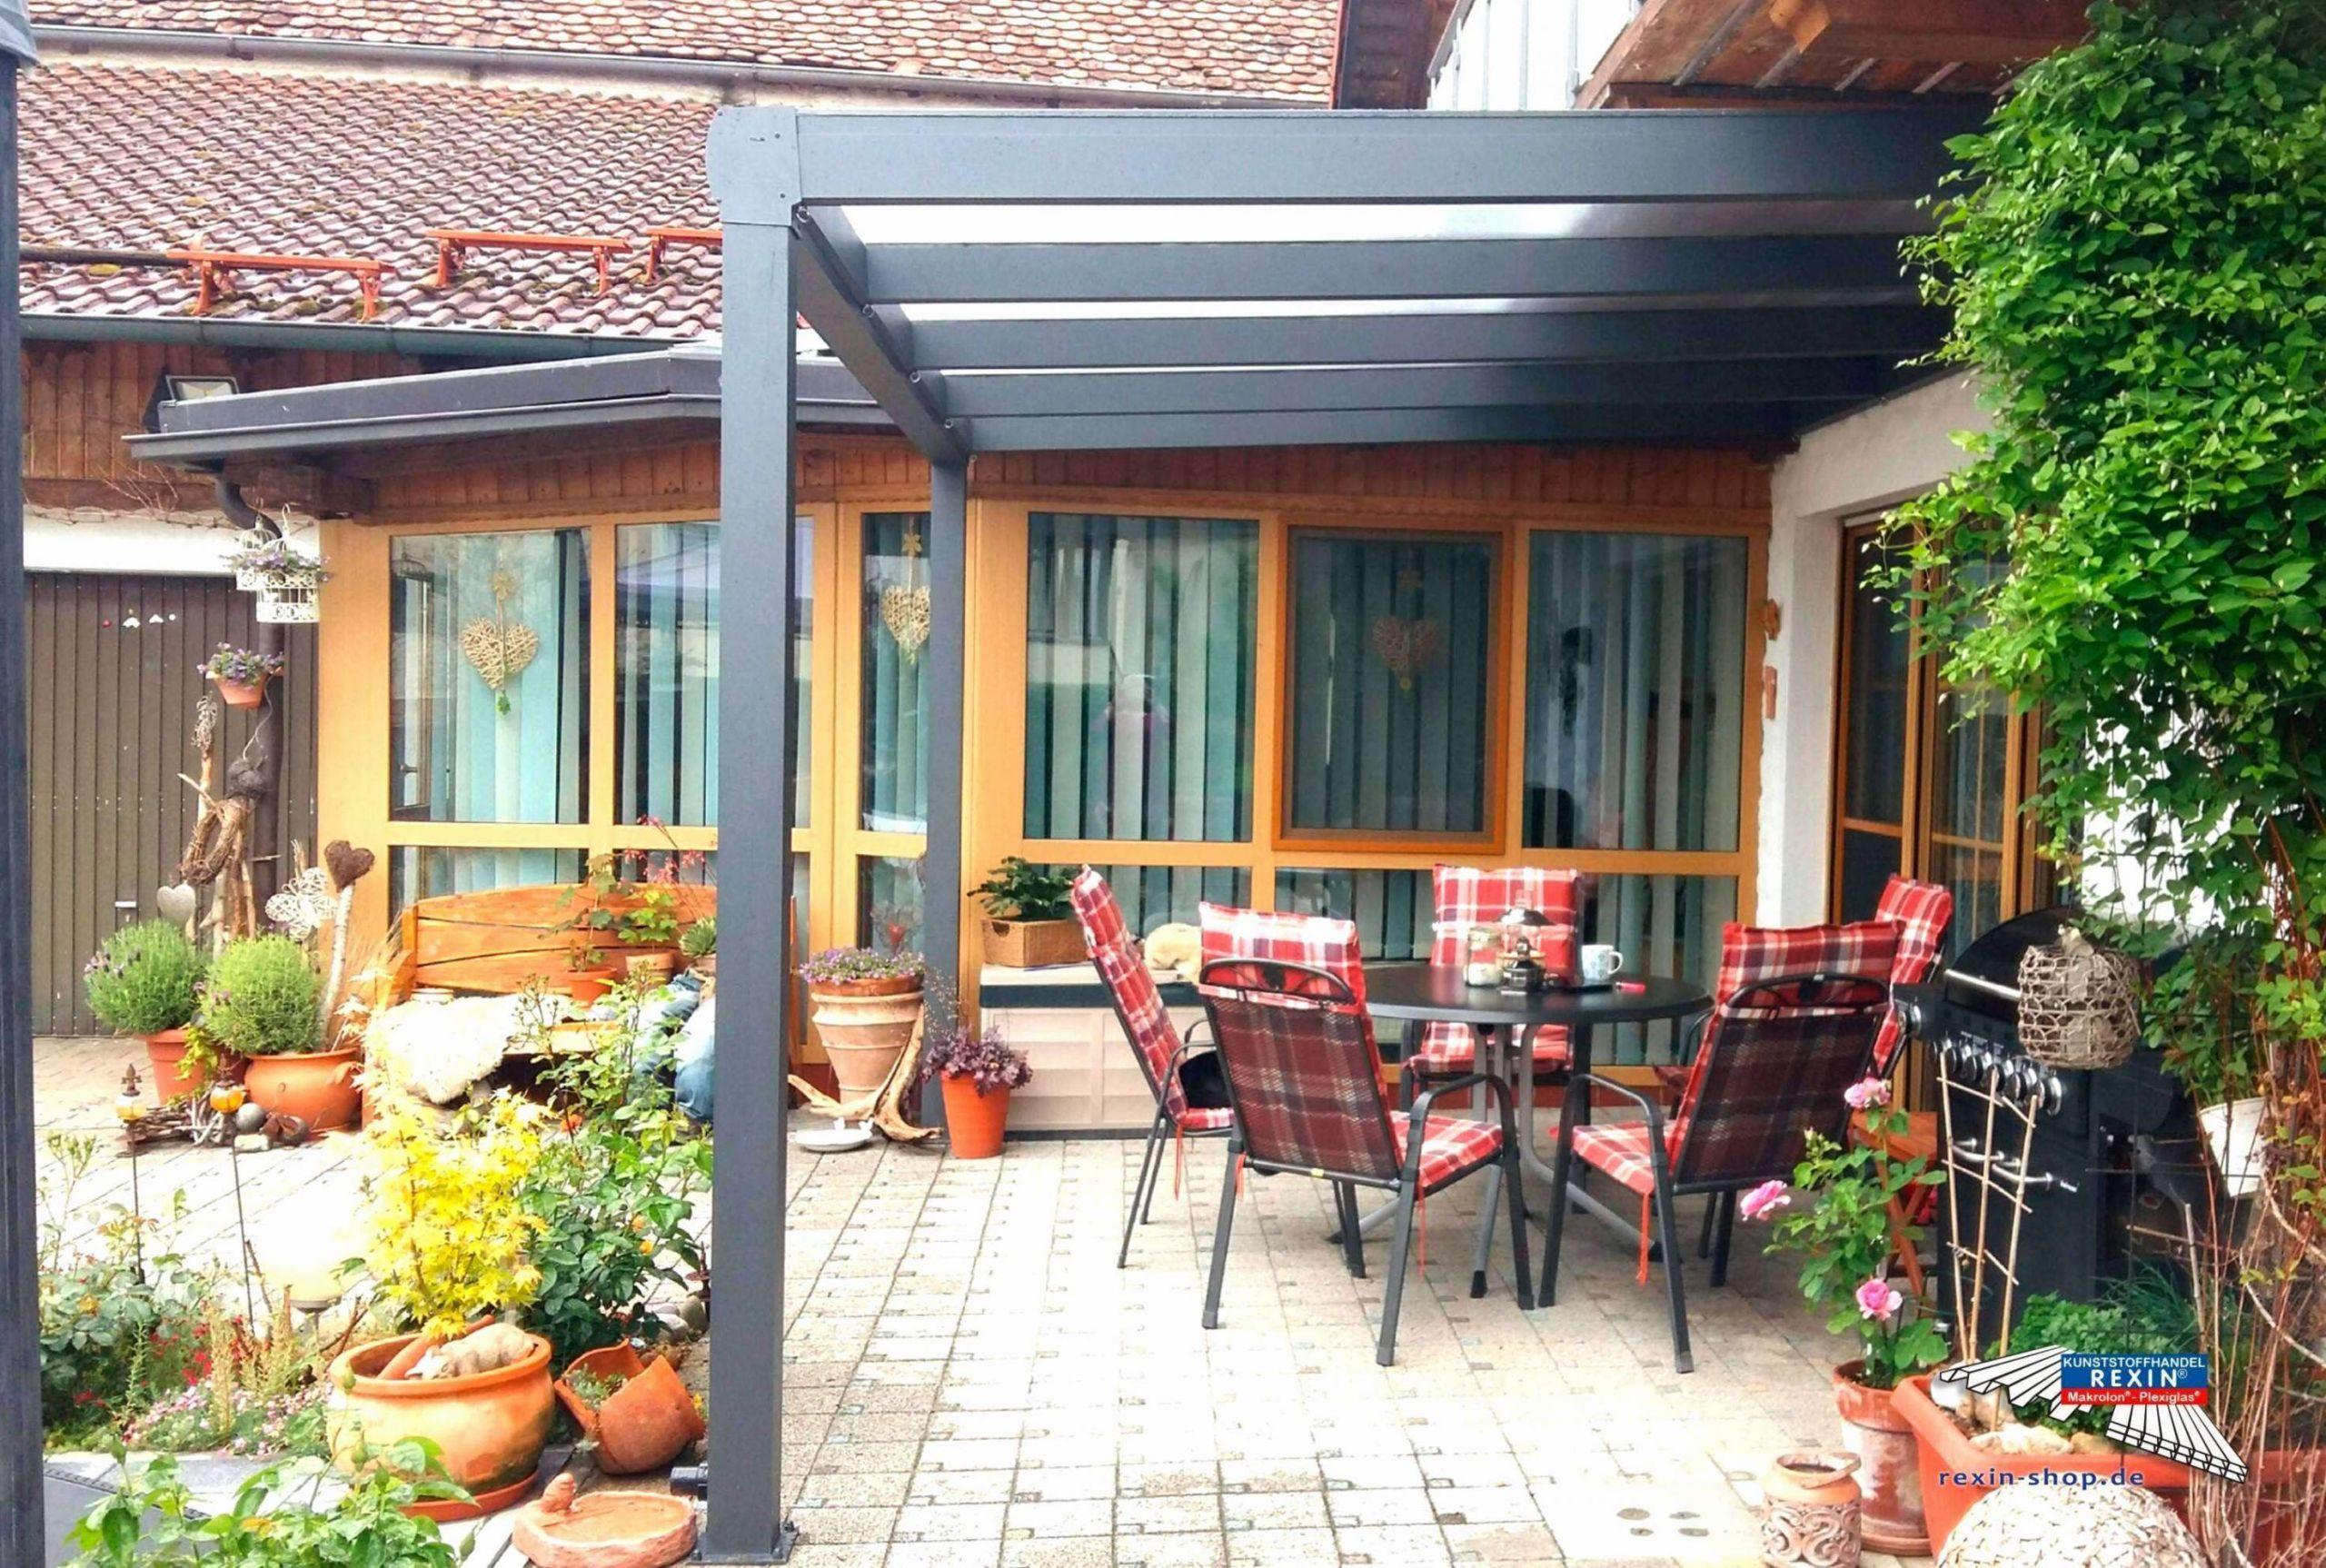 Garten Dekorieren Ideen Elegant Deko Garten Selber Machen — Temobardz Home Blog